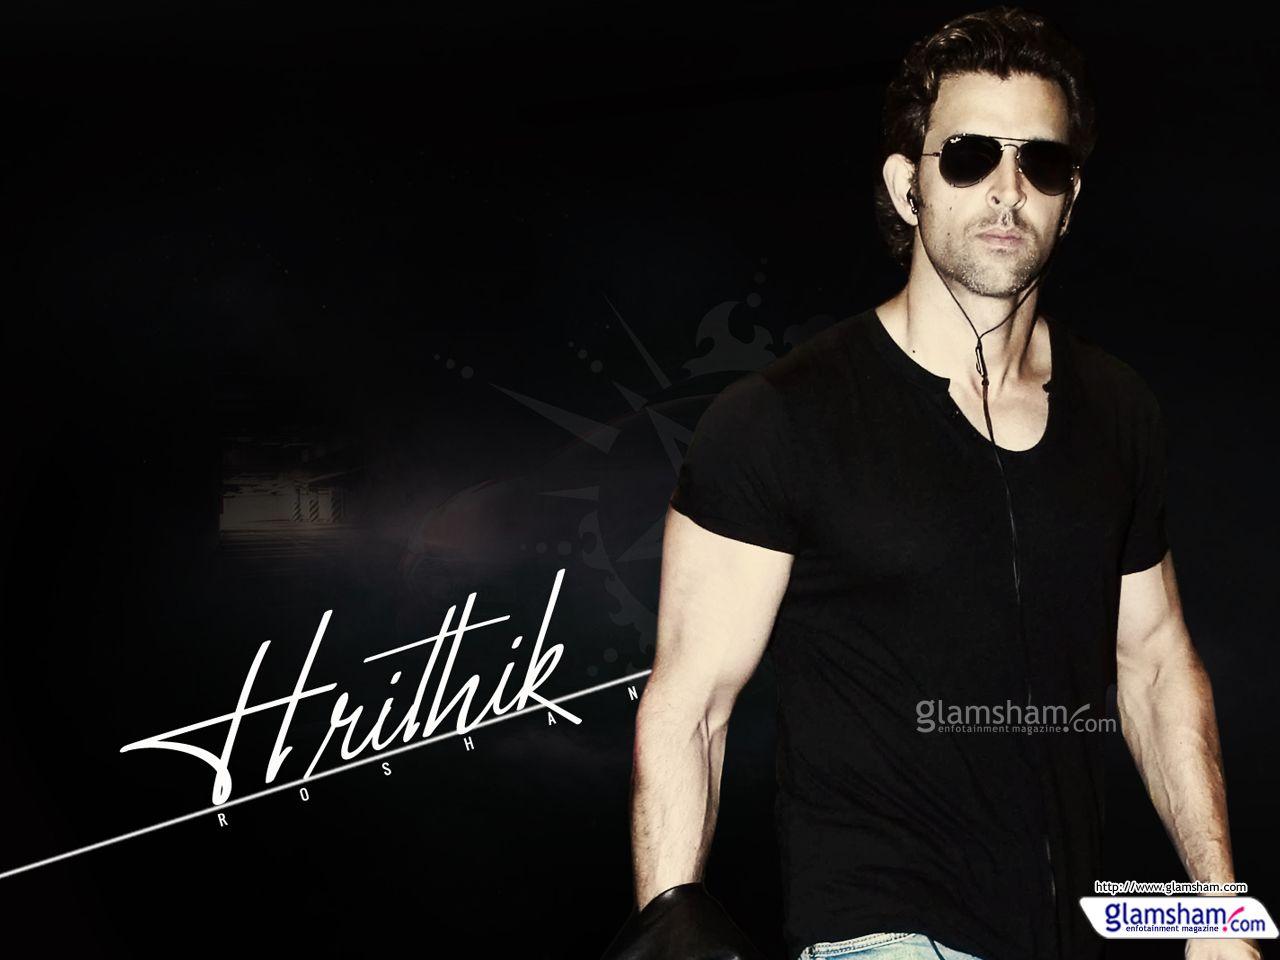 hrithik roshan handsome actor hd wallpaper top wallpapers | 3d